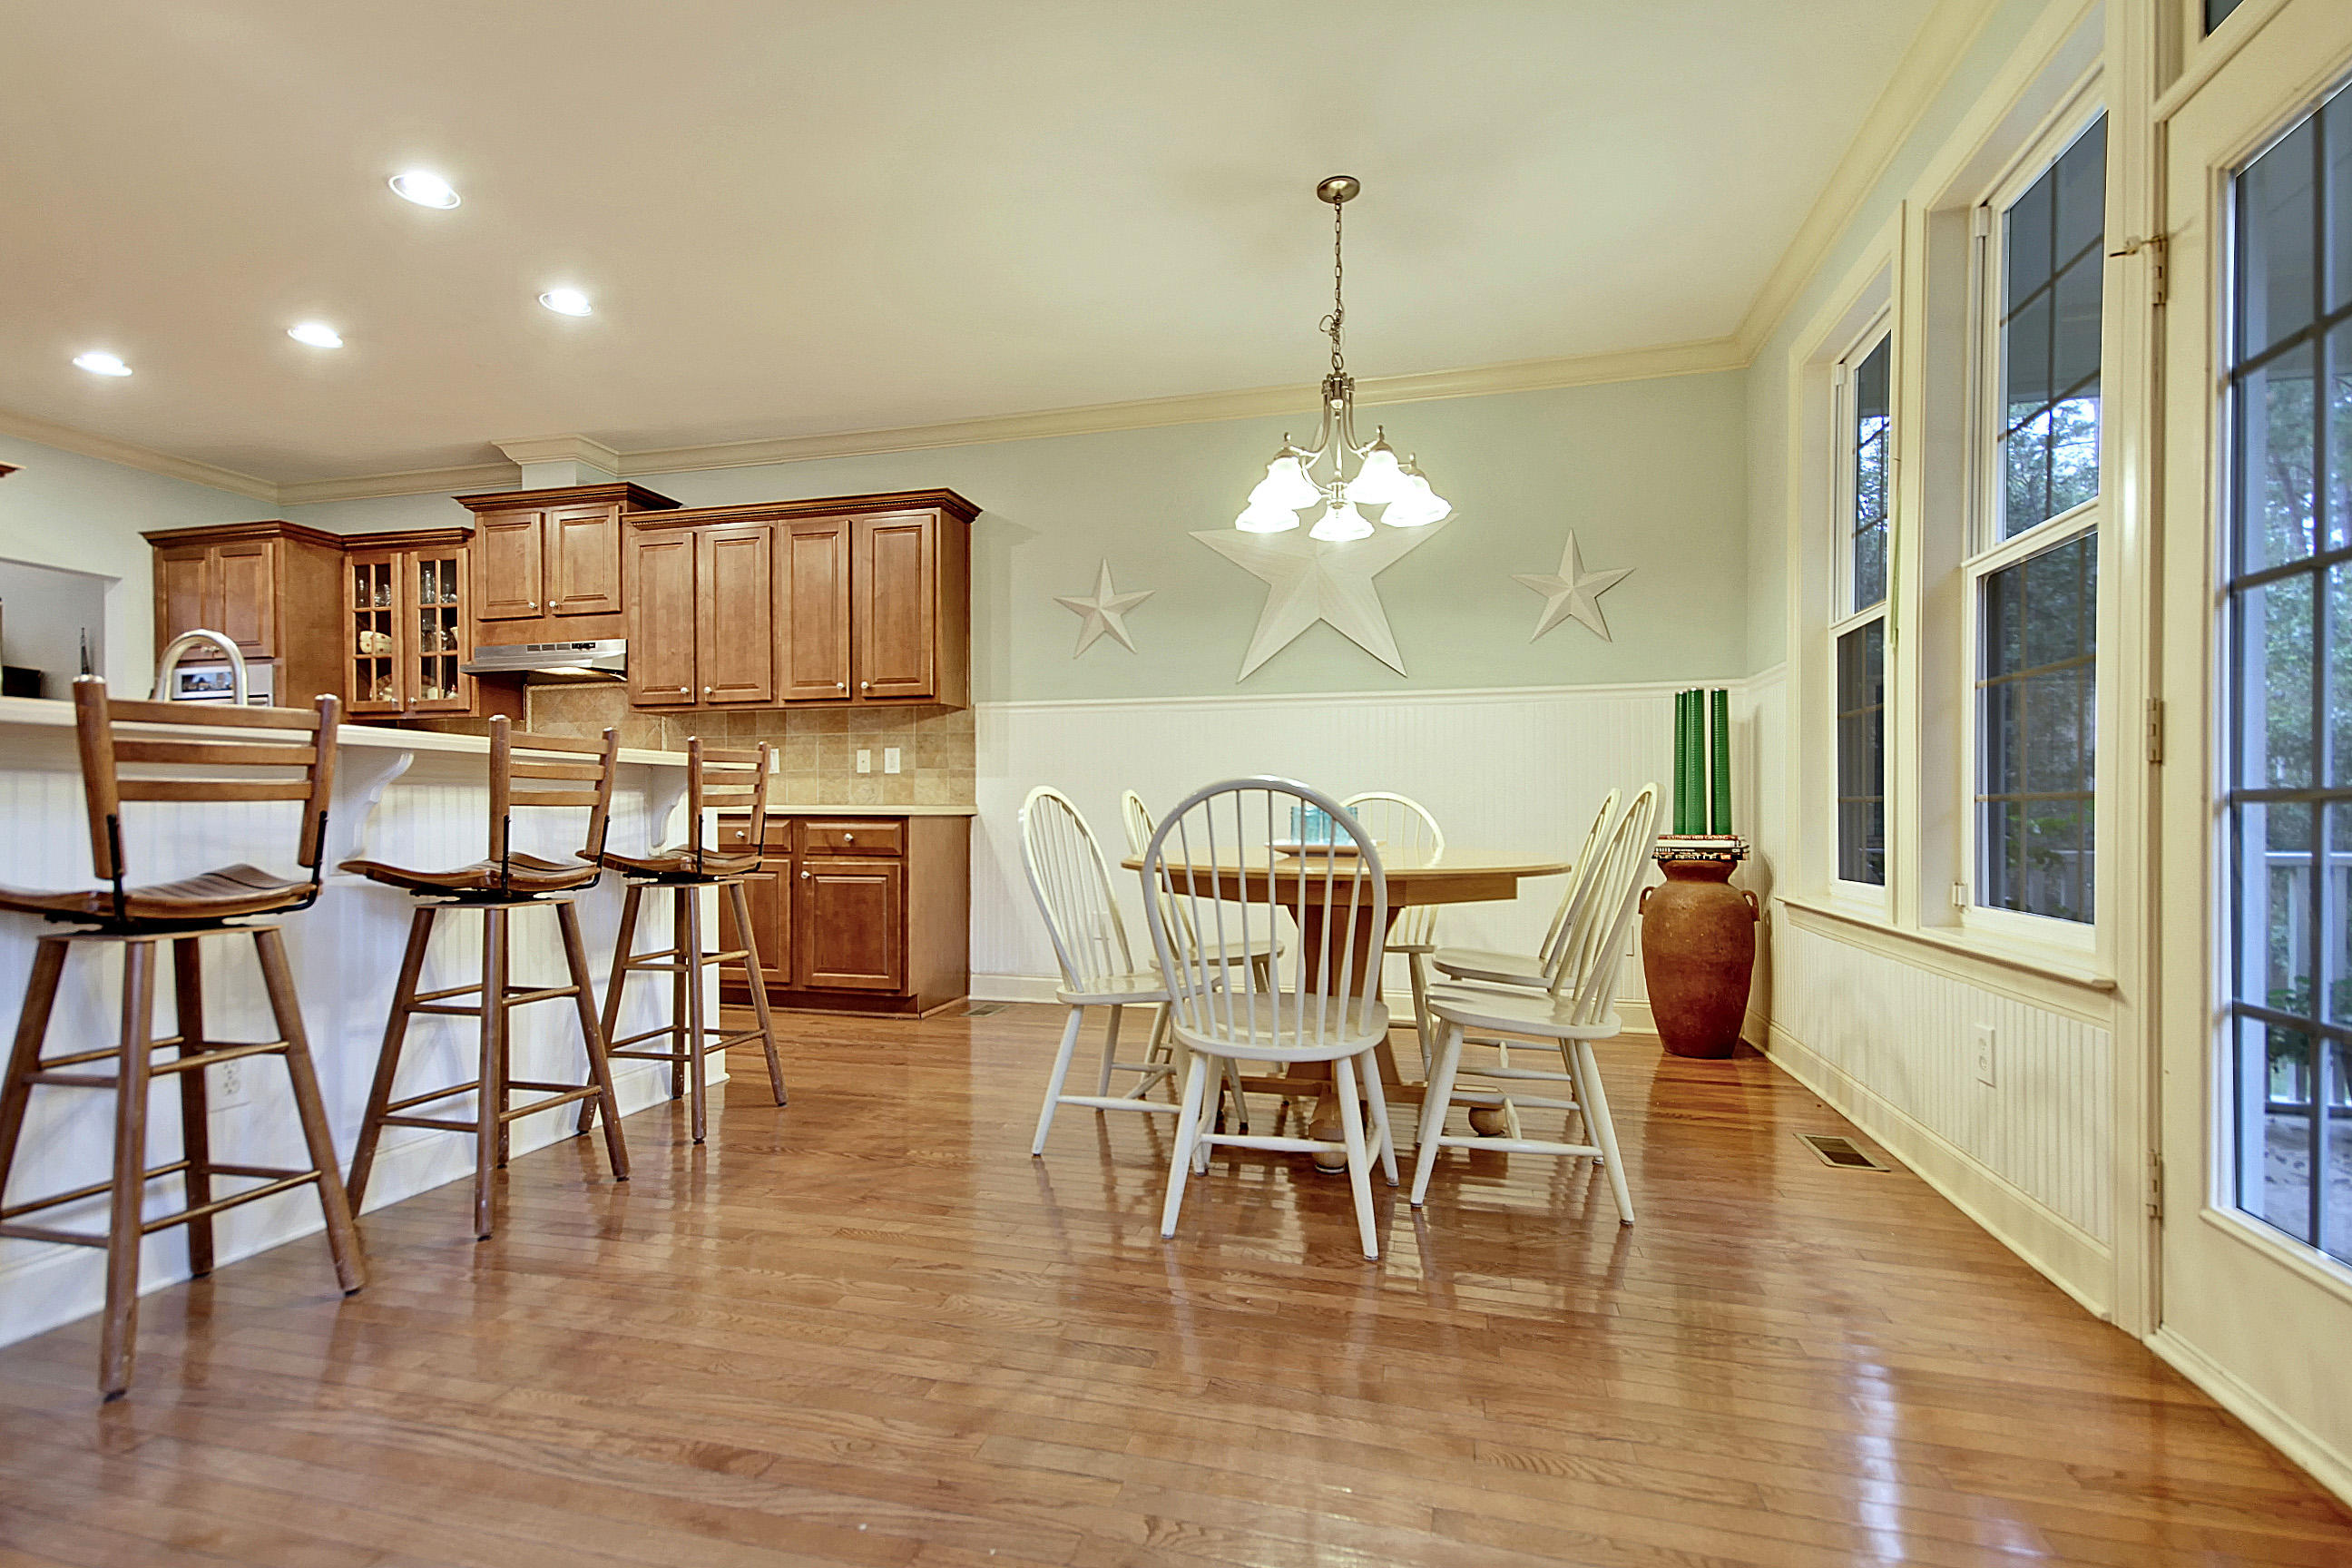 Dunes West Homes For Sale - 2449 Darts Cove, Mount Pleasant, SC - 46